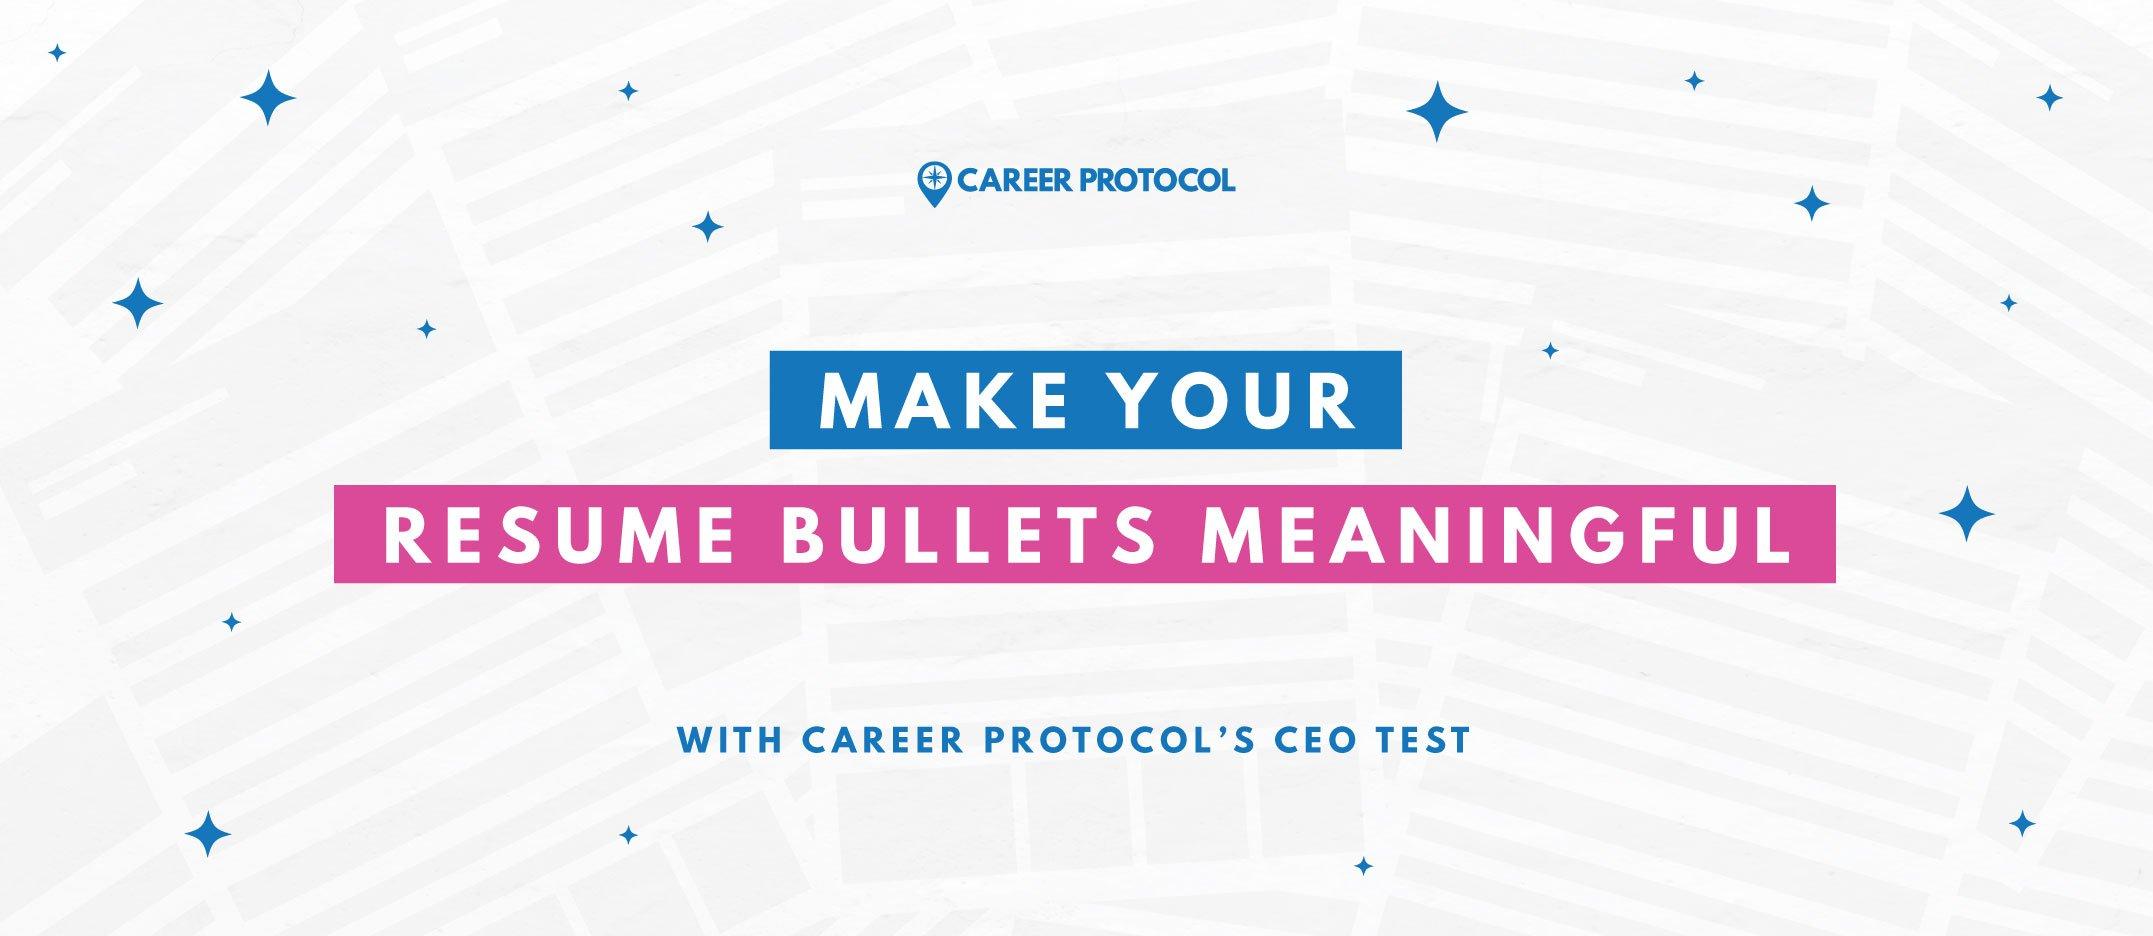 Resume bullets